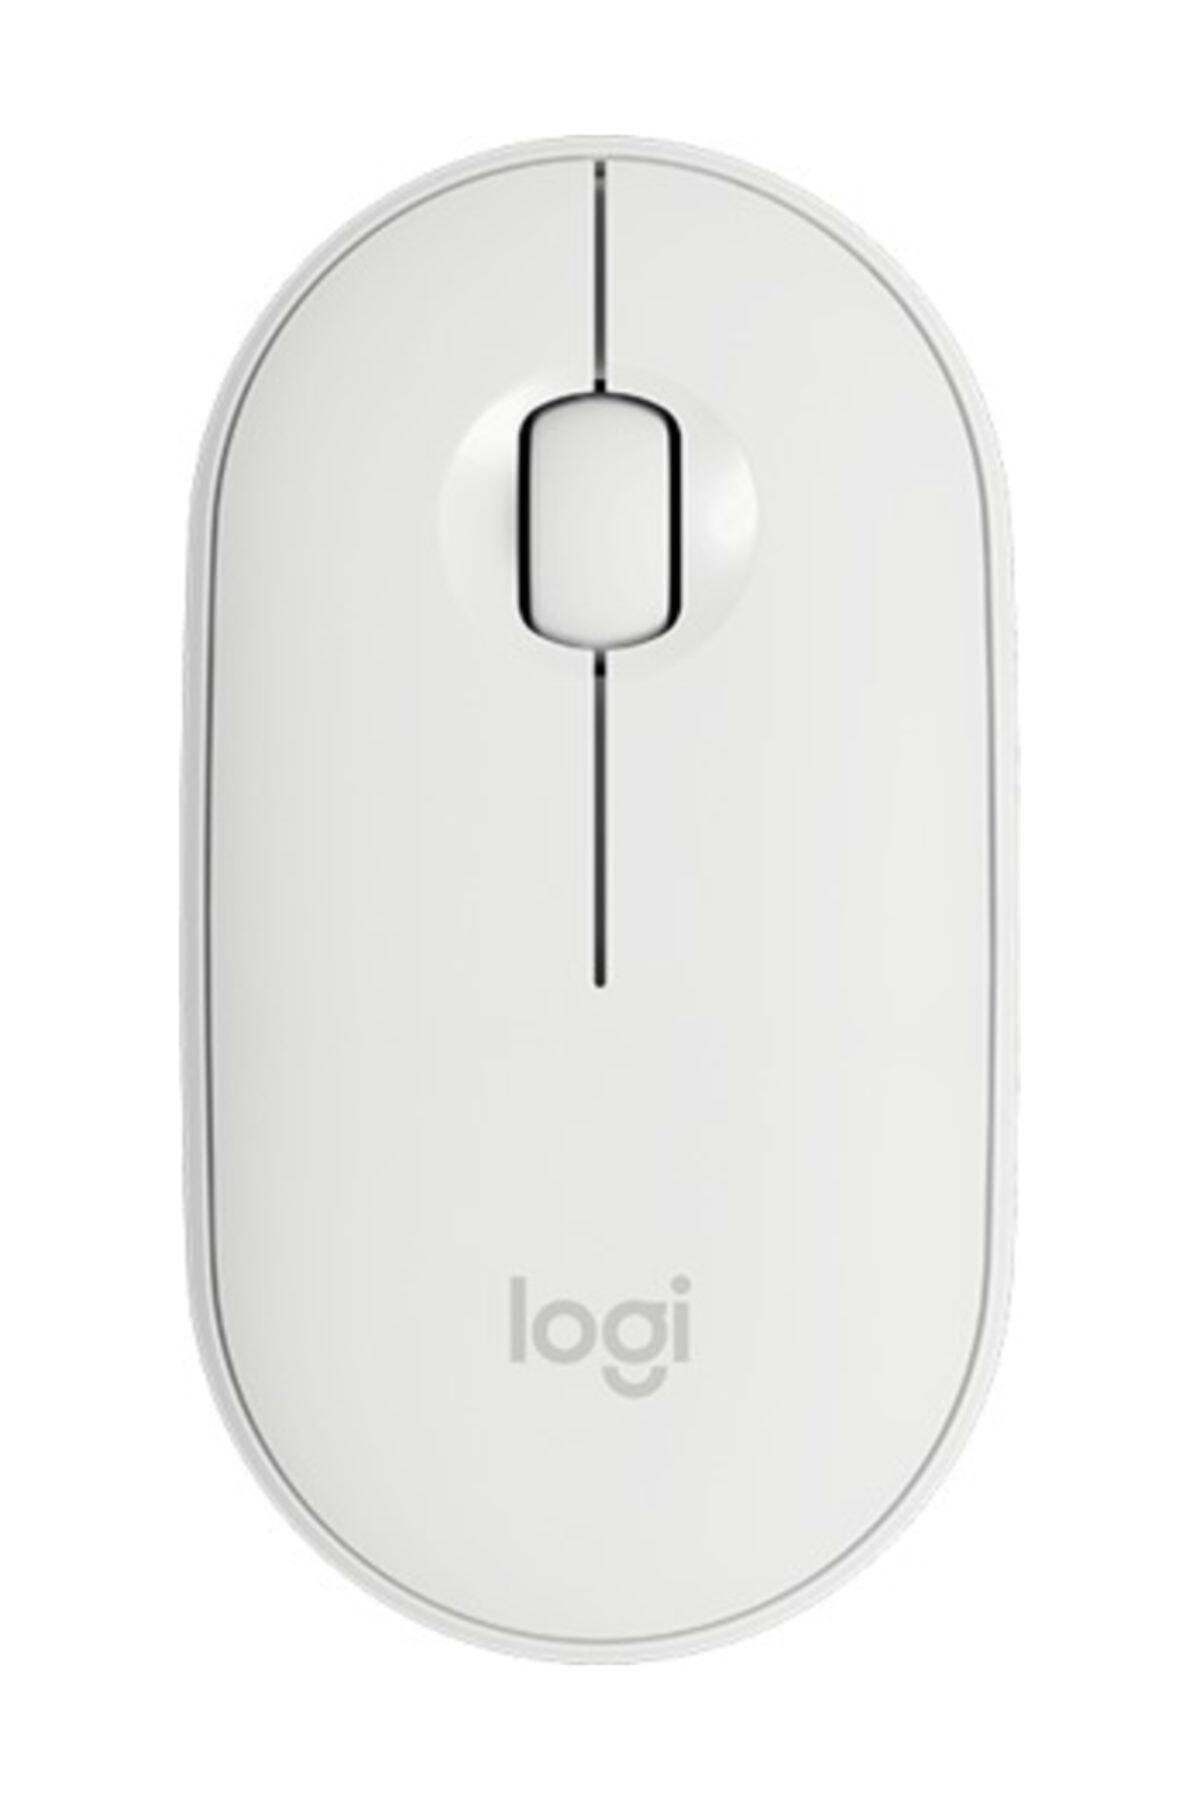 logitech Beyaz Pebble M350 Kablosuz Bluetooth Mouse 1